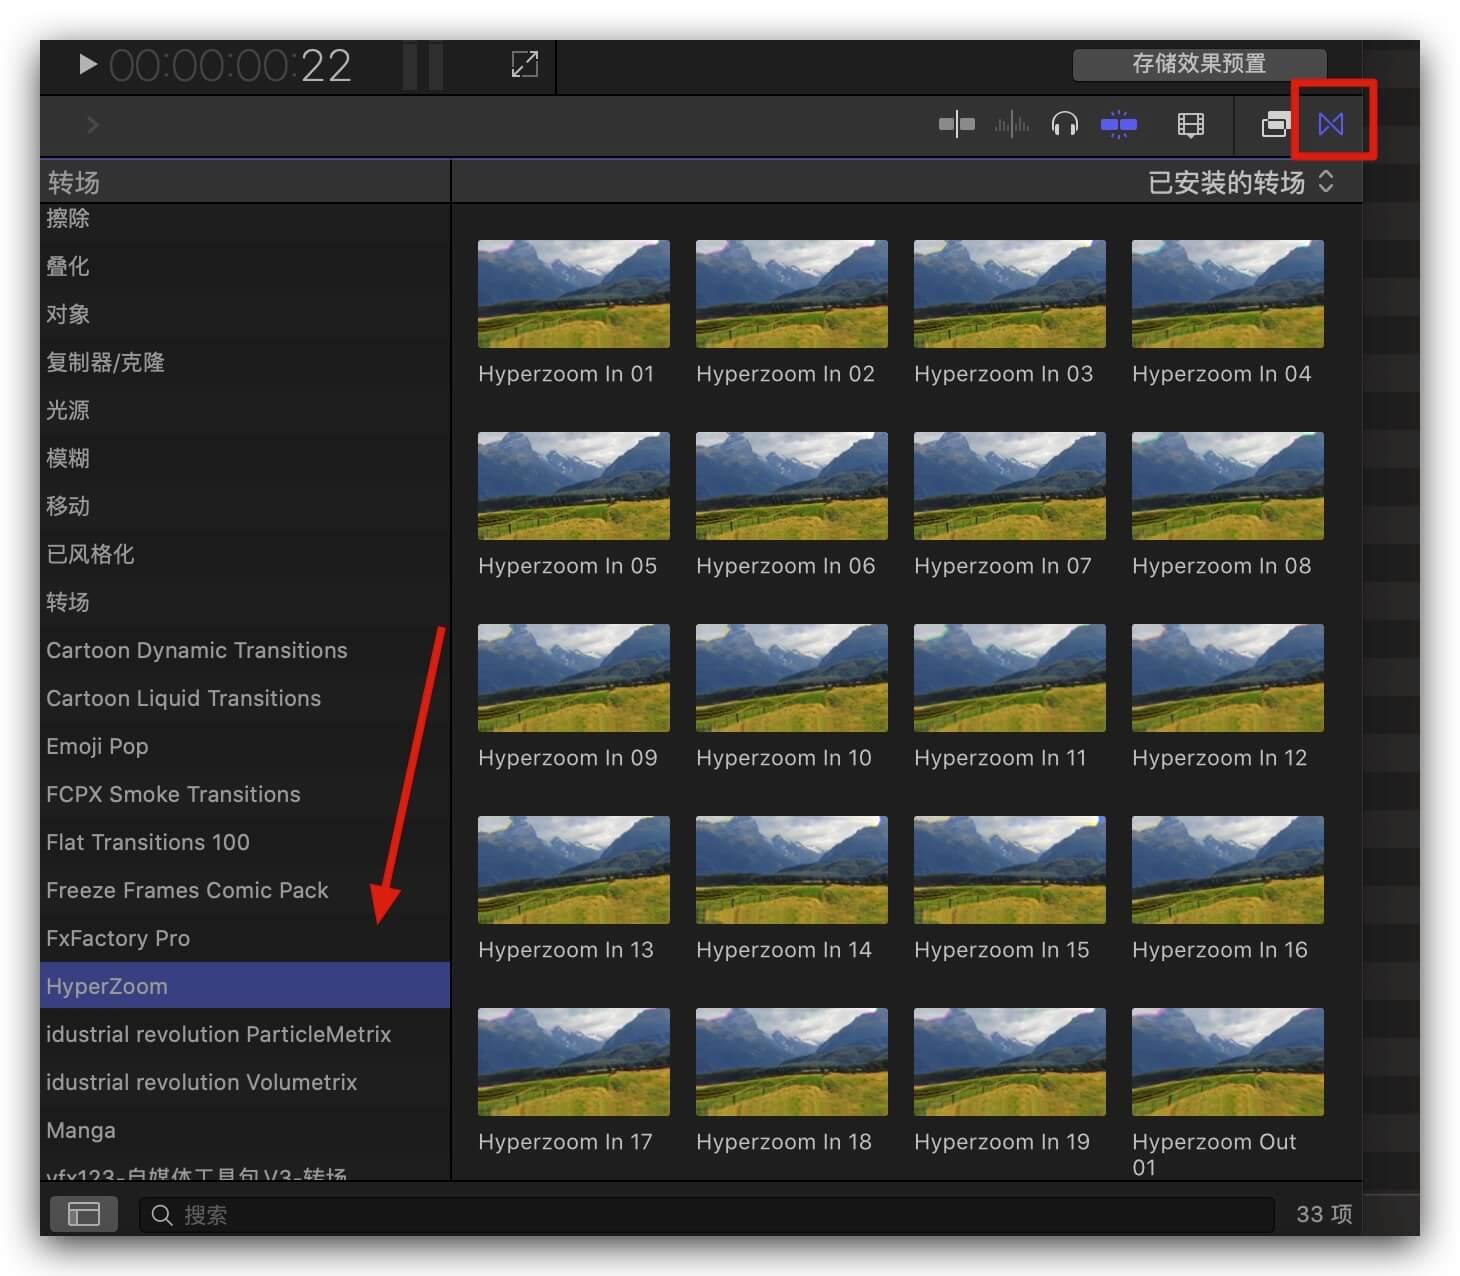 fcpx转场插件 33组镜头果冻伸缩旋转卡点效果过渡 Hyper Zoom Transitions